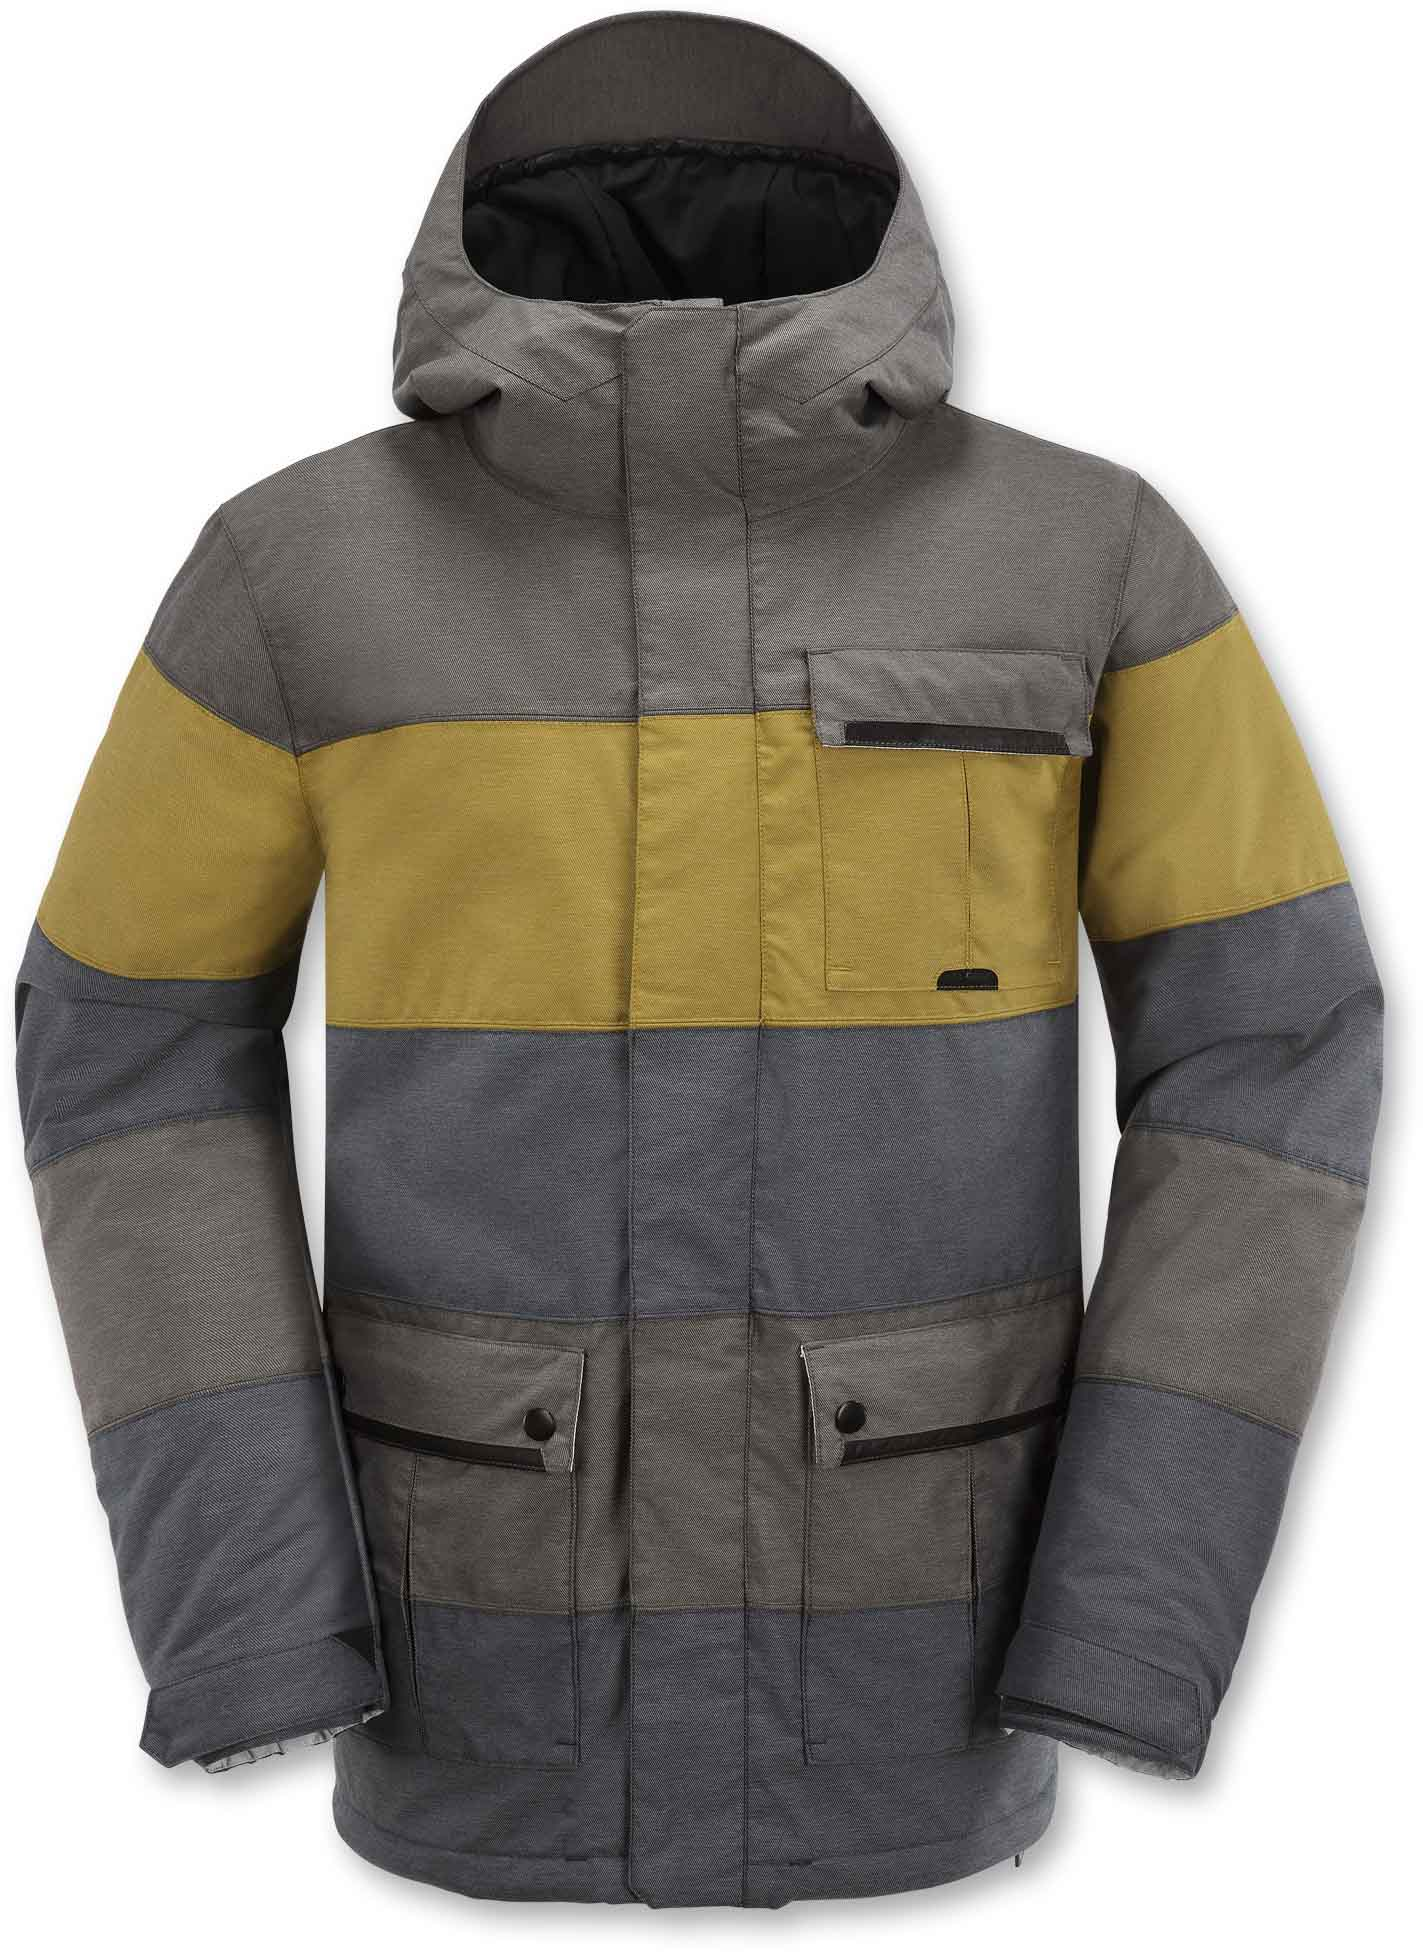 image volcom-captain-insulated-jacket-jpg